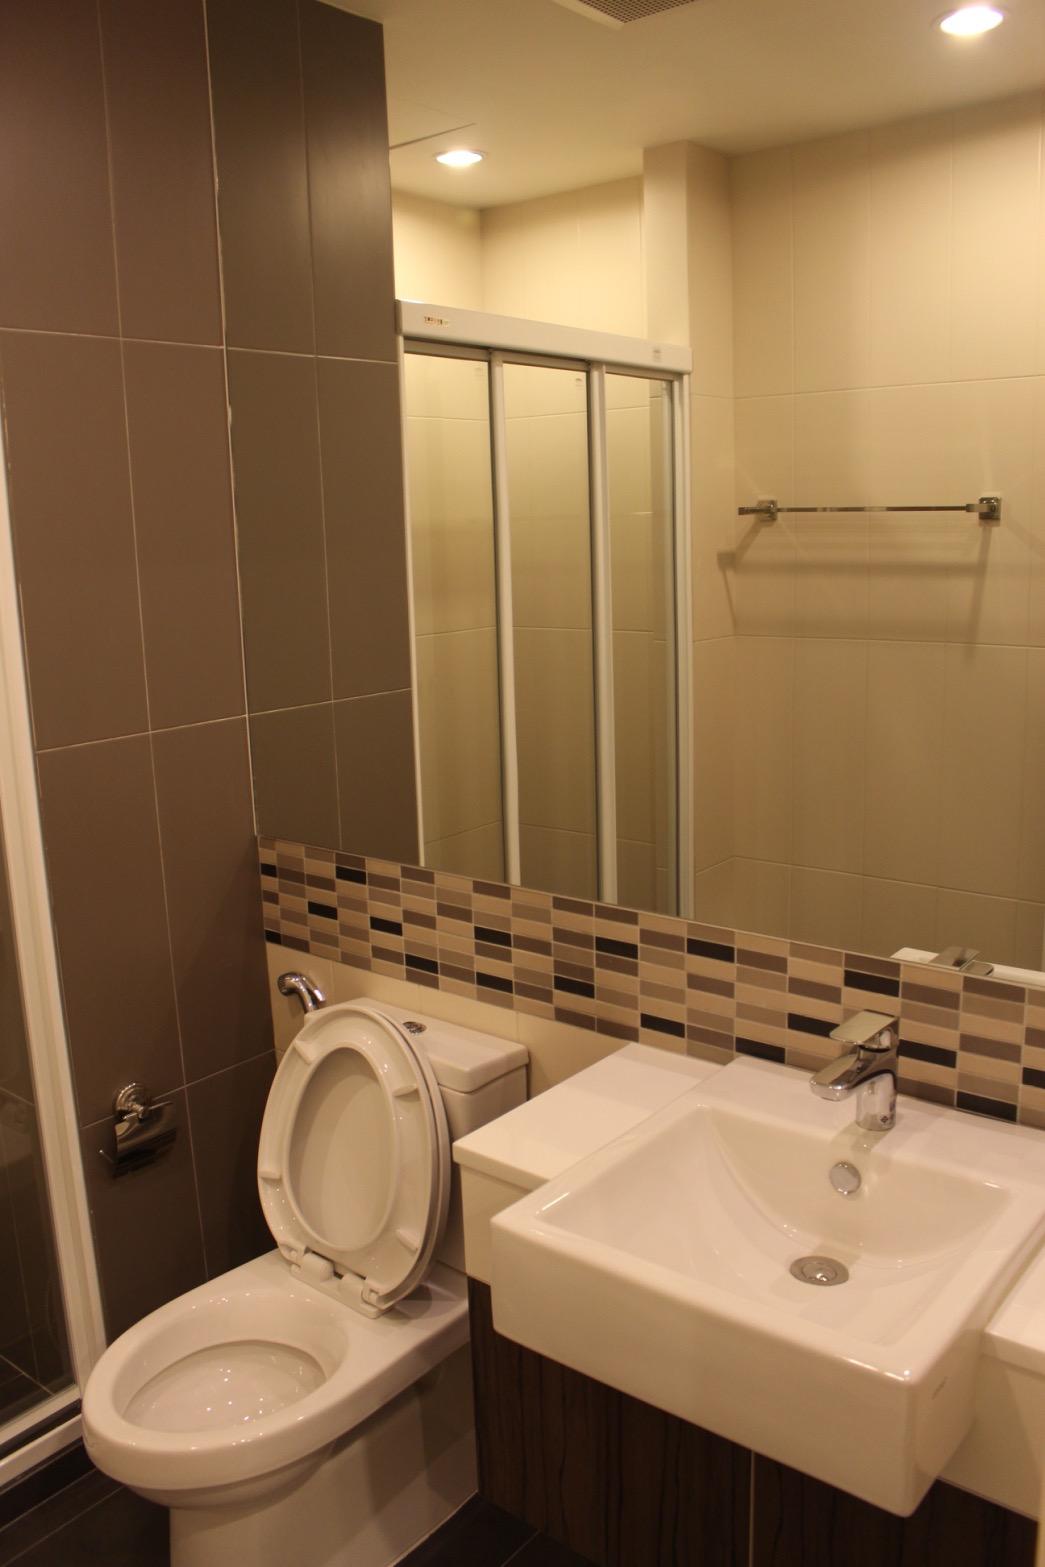 brand new one bedroom condo for rent in ari promove bangkok one bedroom loft condo douglas fir resort amp chalets